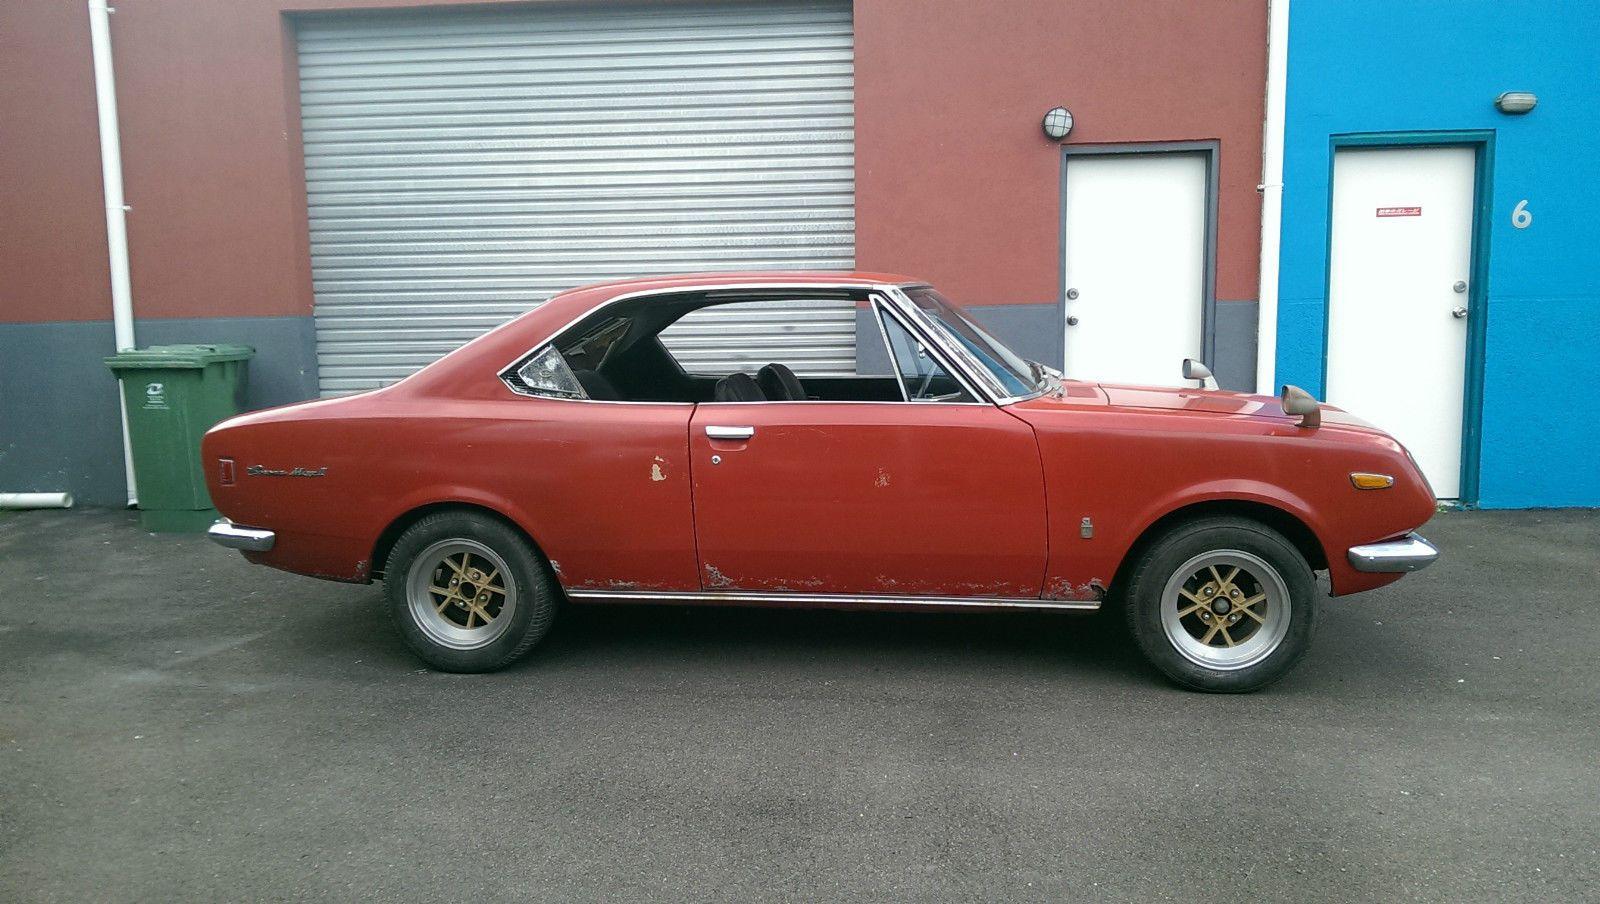 Toyota corona mark ii rt72 classic rare jdm coupe barn find project ta22 240k ebay